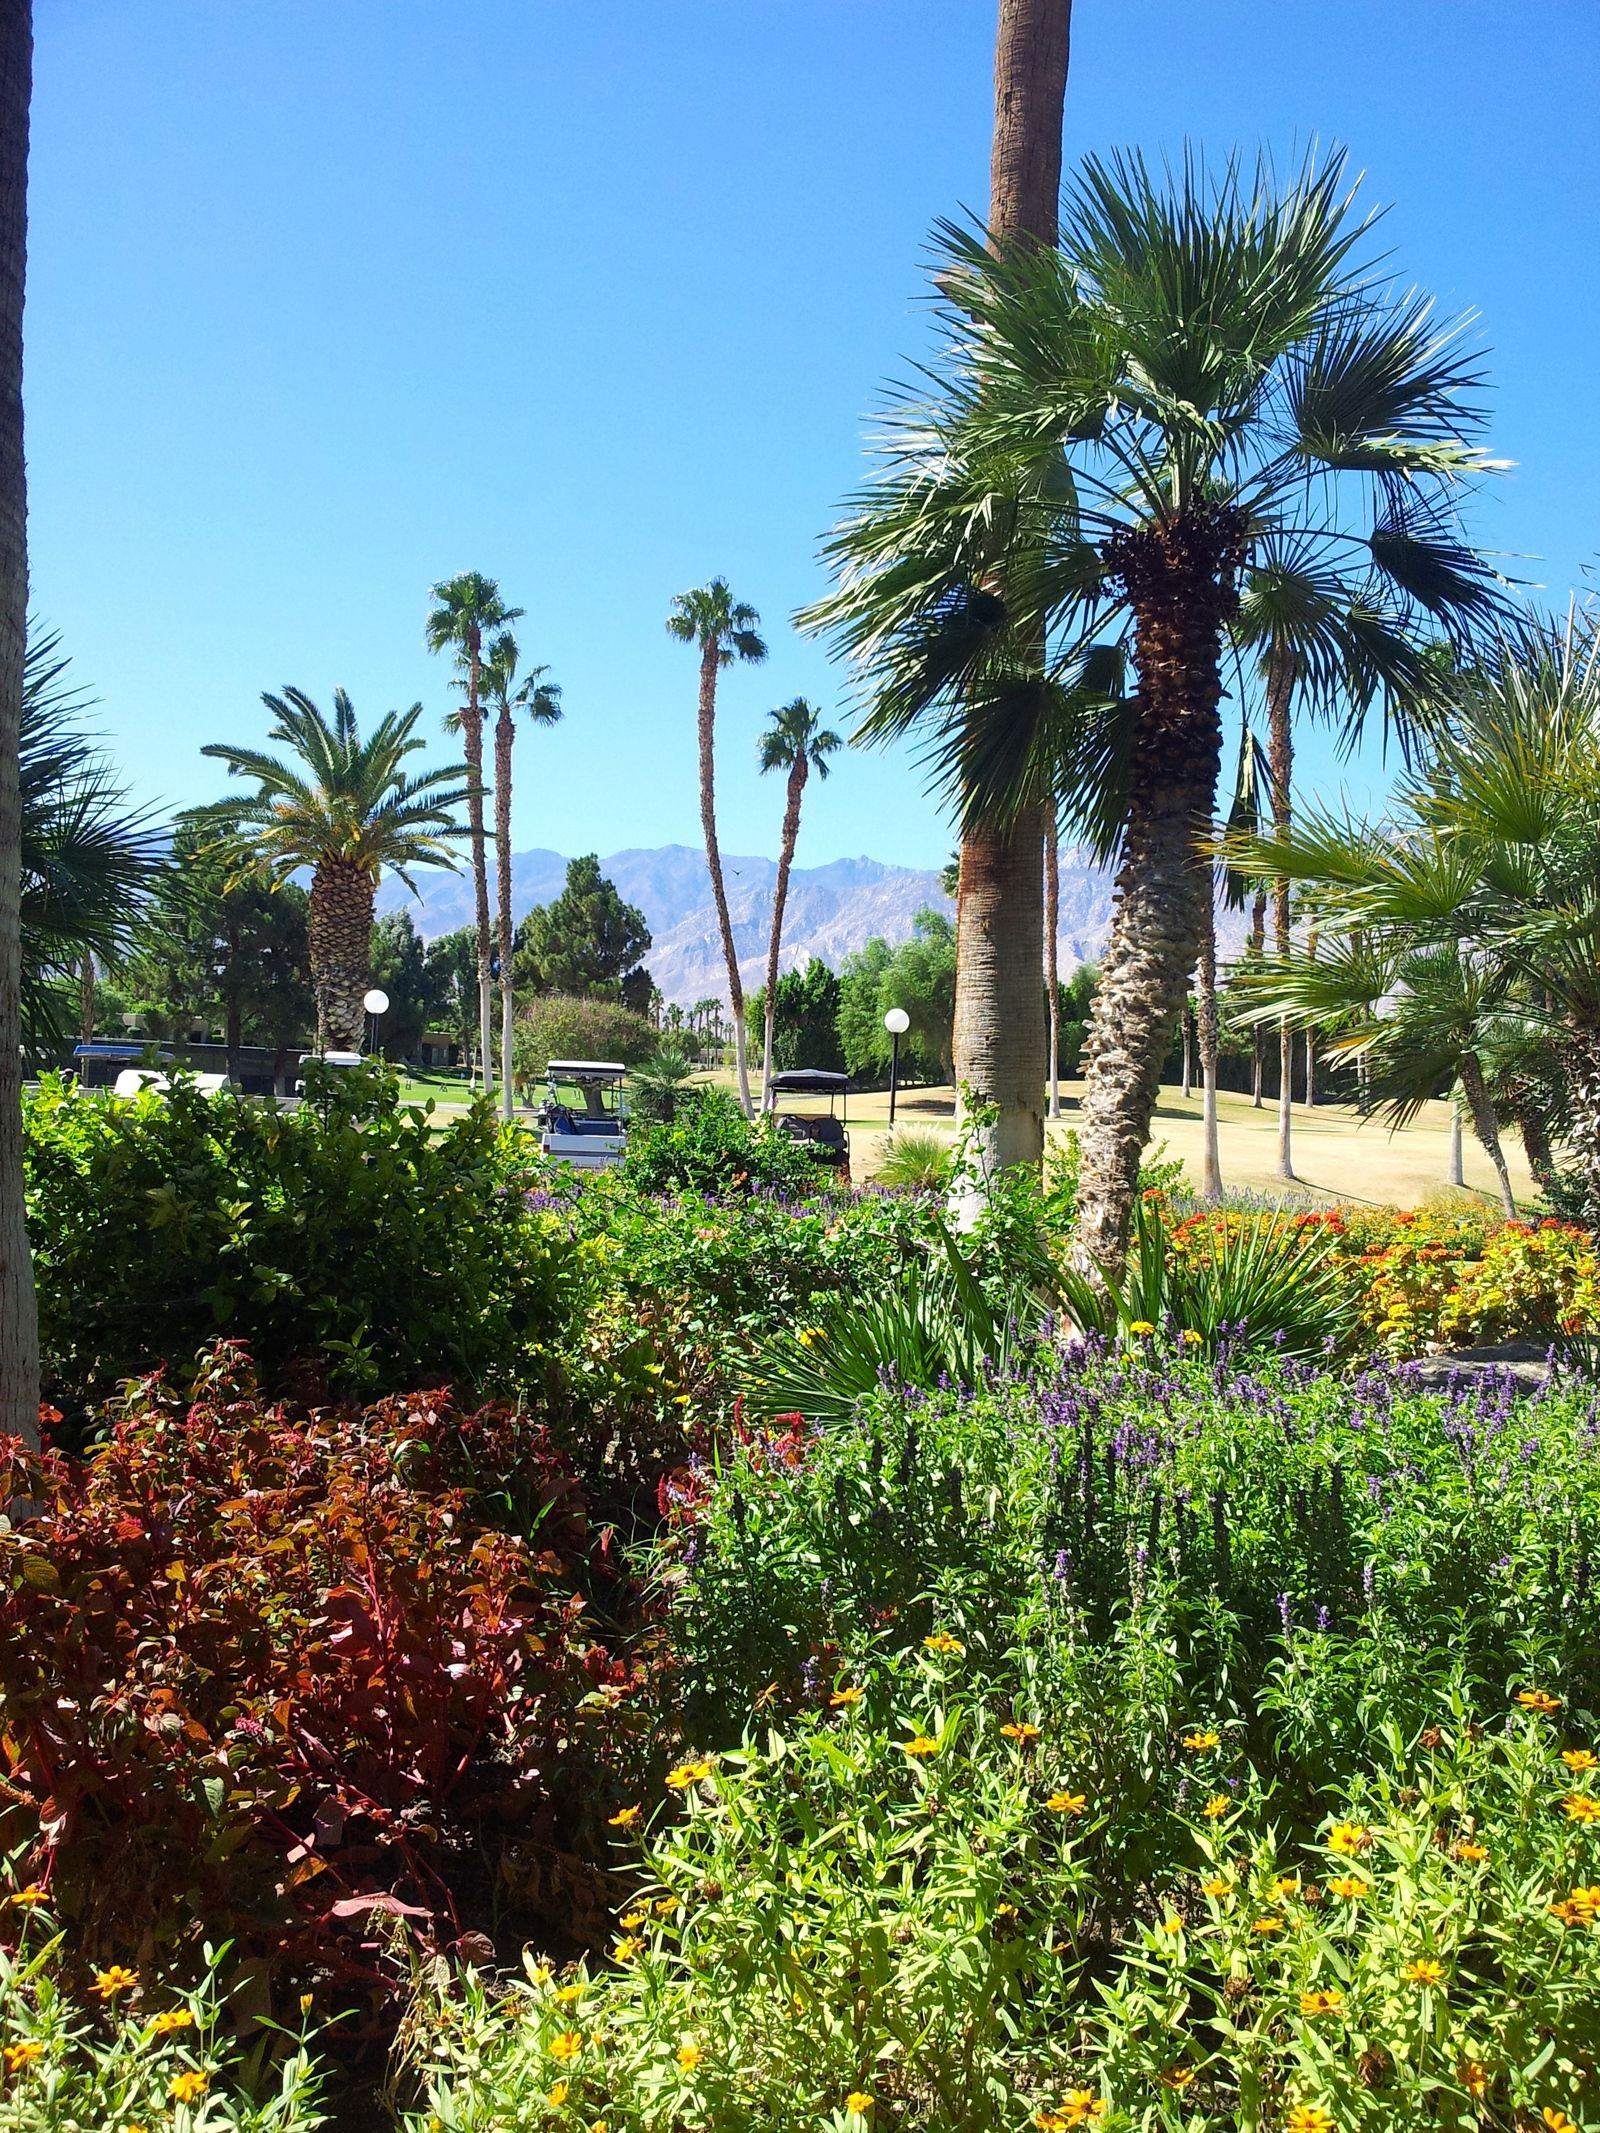 tennis-tourist-desert-princess-golf-course-and-mountains-palm-springs-teri-church